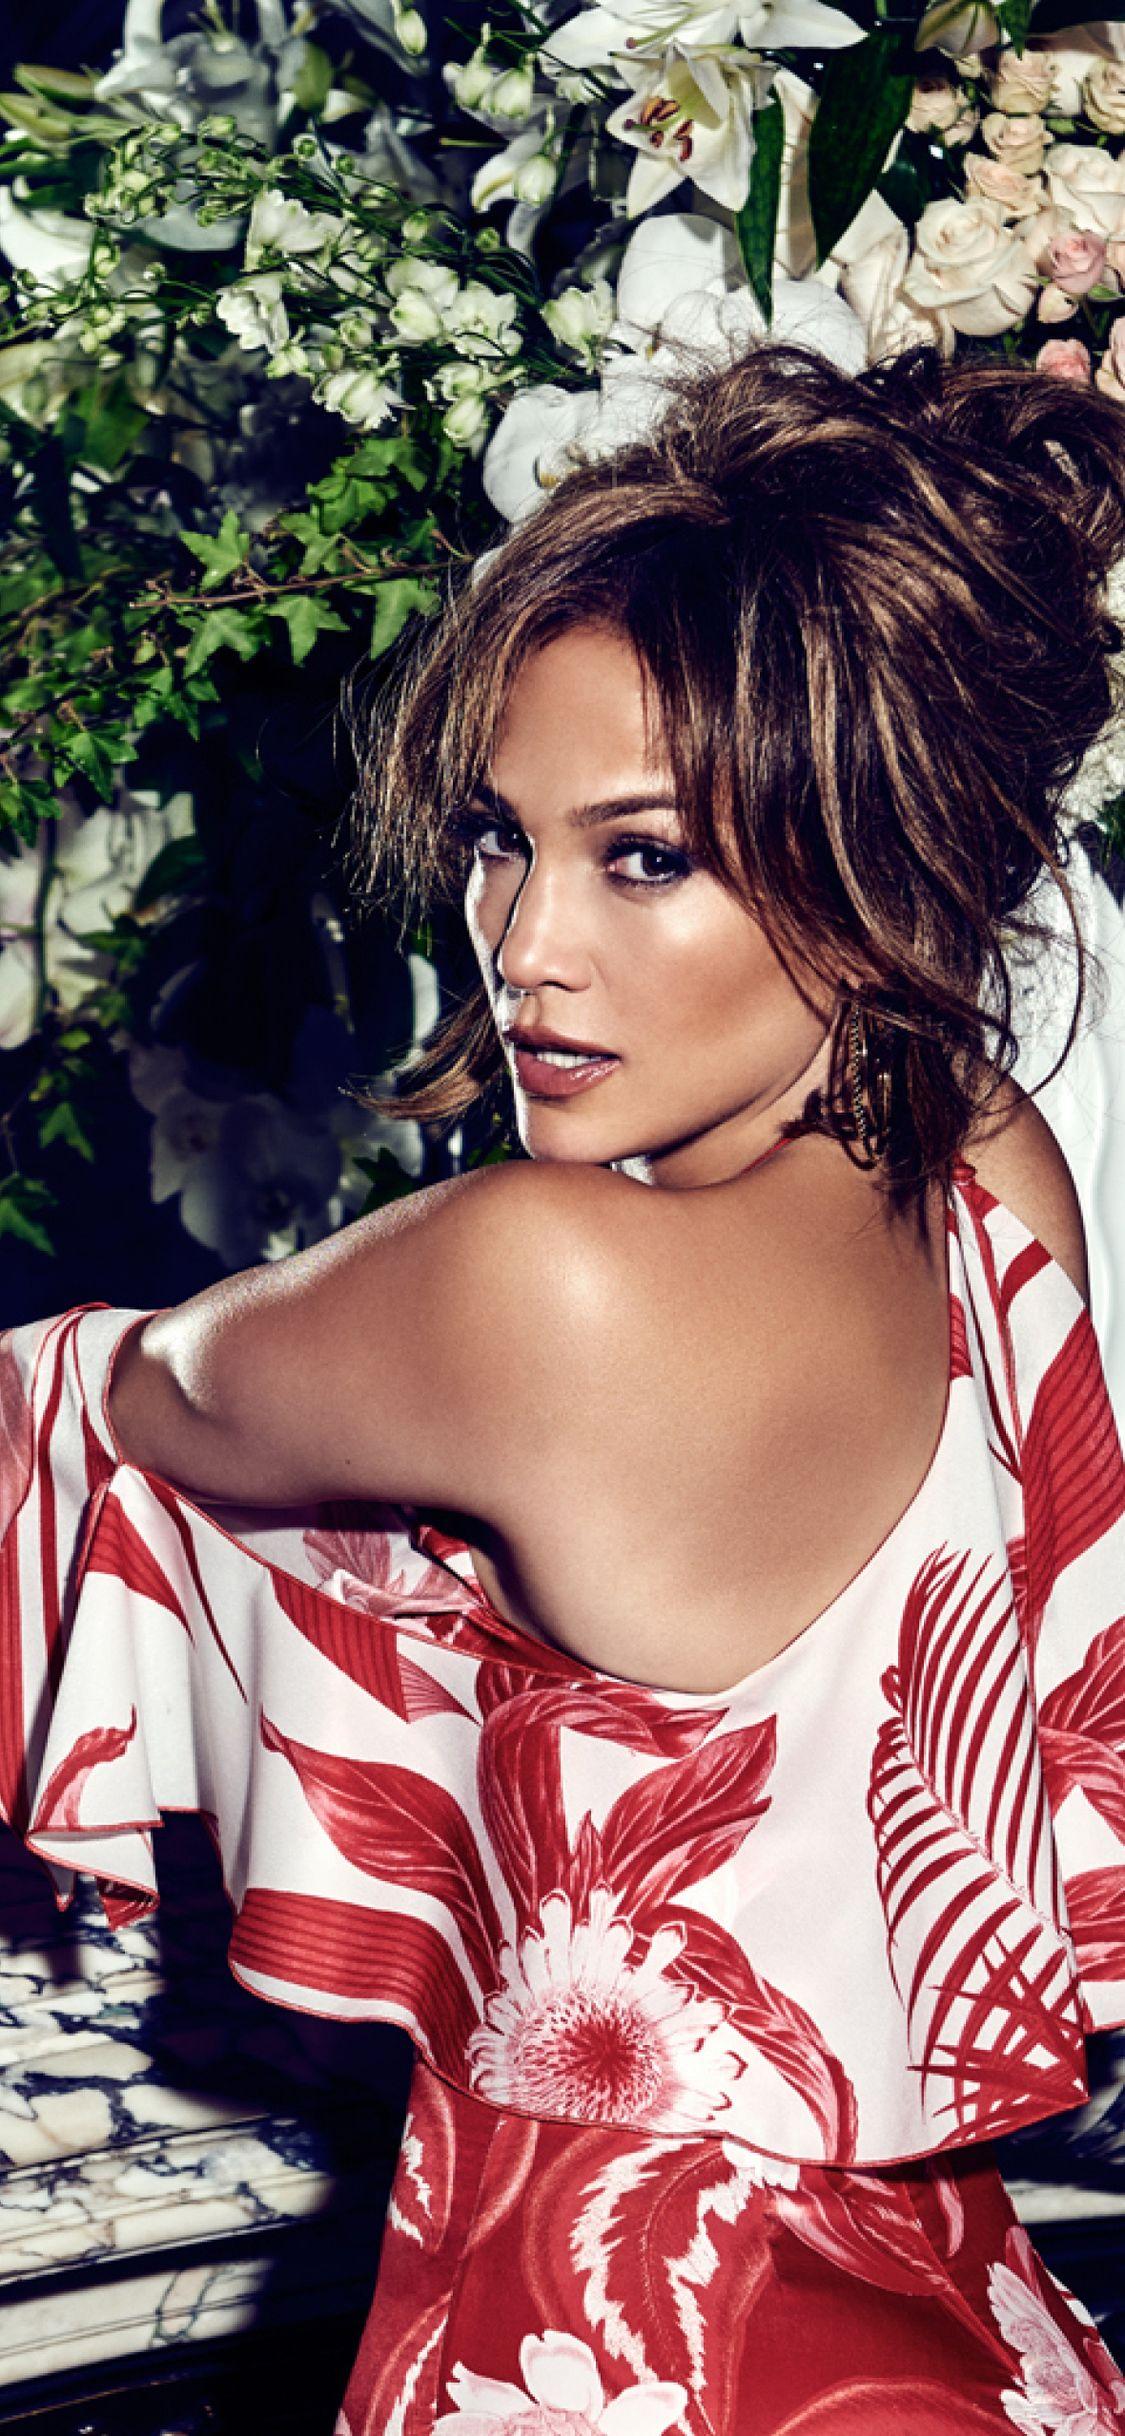 1125x2436 Jennifer Lopez Guess Campaign 2018 Iphone Xs Iphone 10 Iphone X Hd 4k Wallpapers Images Bac Jennifer Lopez Wallpaper Jennifer Lopez Guess Campaigns